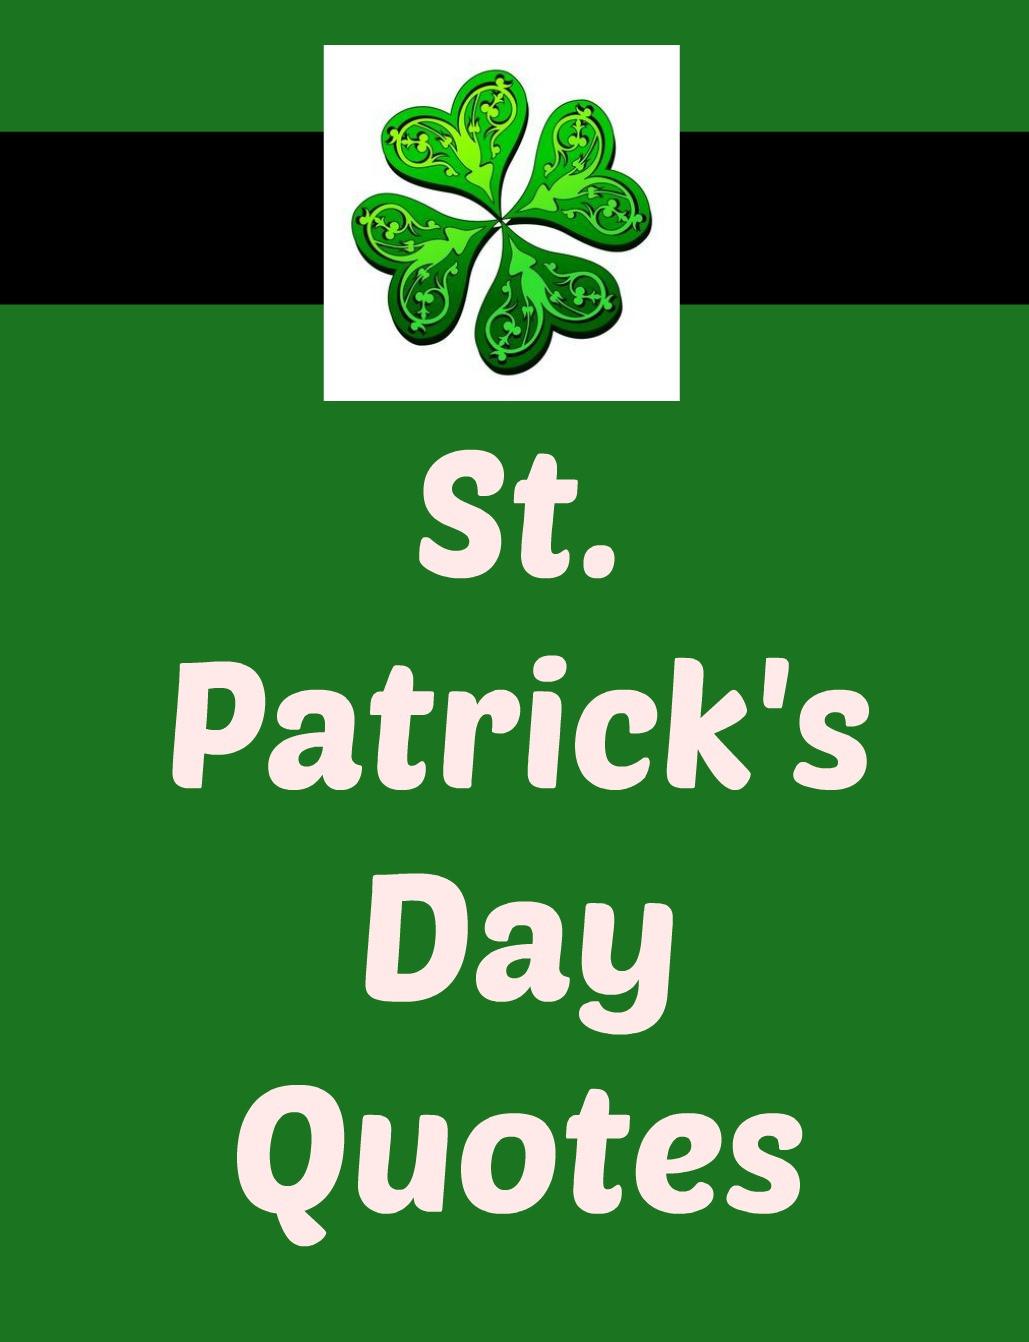 Saint Patrick's Day Quotes  St Patrick s Day Quotes Joyful Quotes